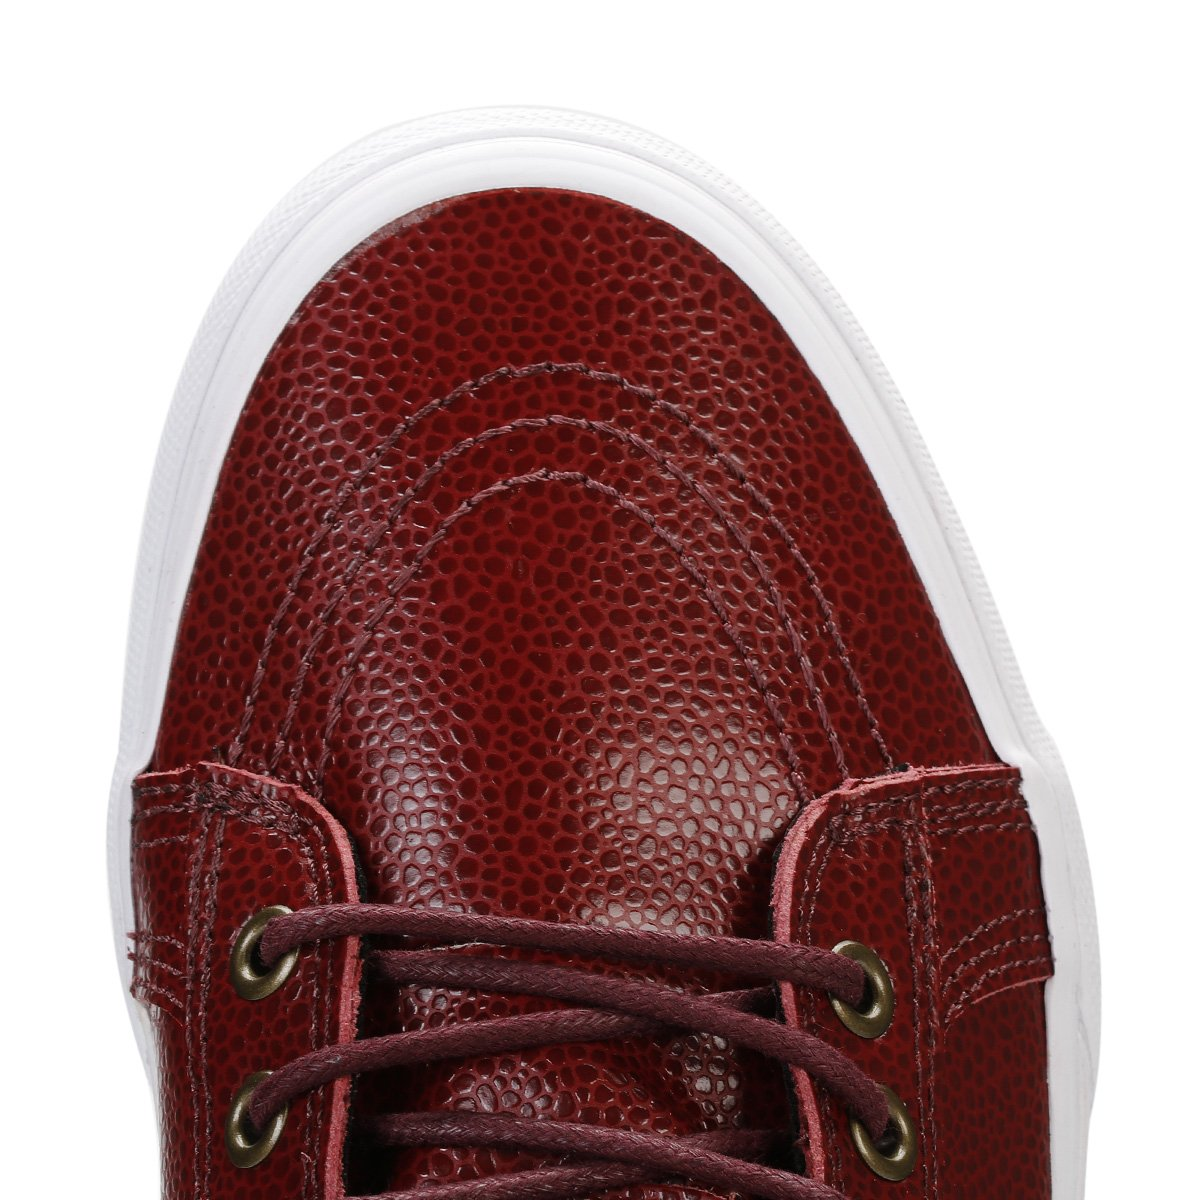 4233305f54 Vans Womens Port Royale Pebble Leather SK8-Hi 46 MTE Trainers  Amazon.ca   Shoes   Handbags